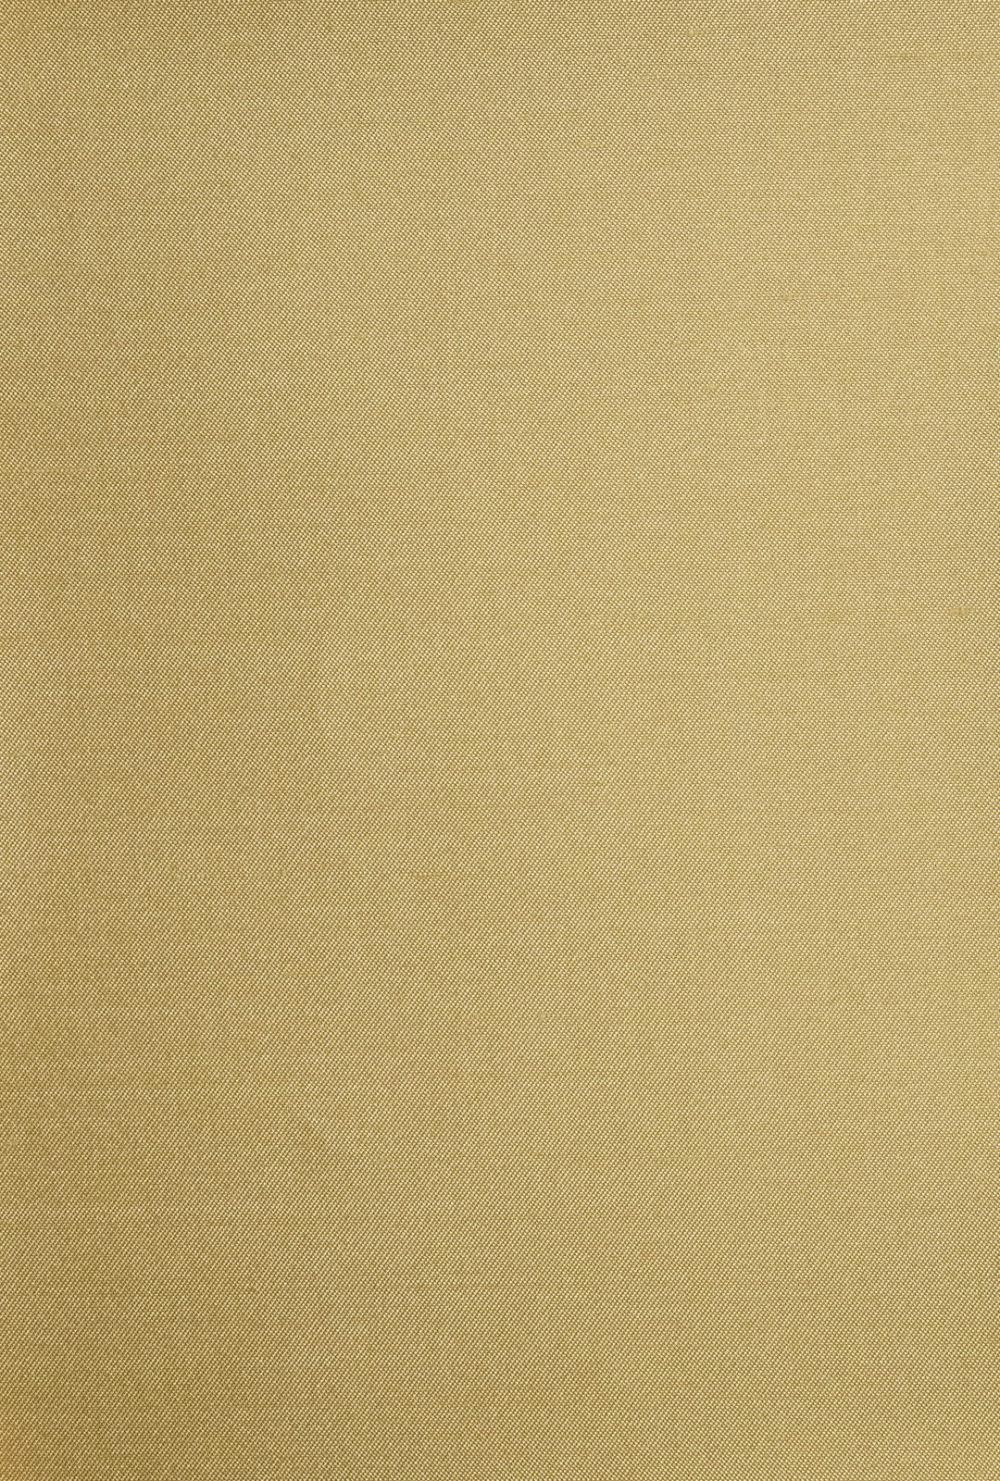 Silk Shantu-uni 9193